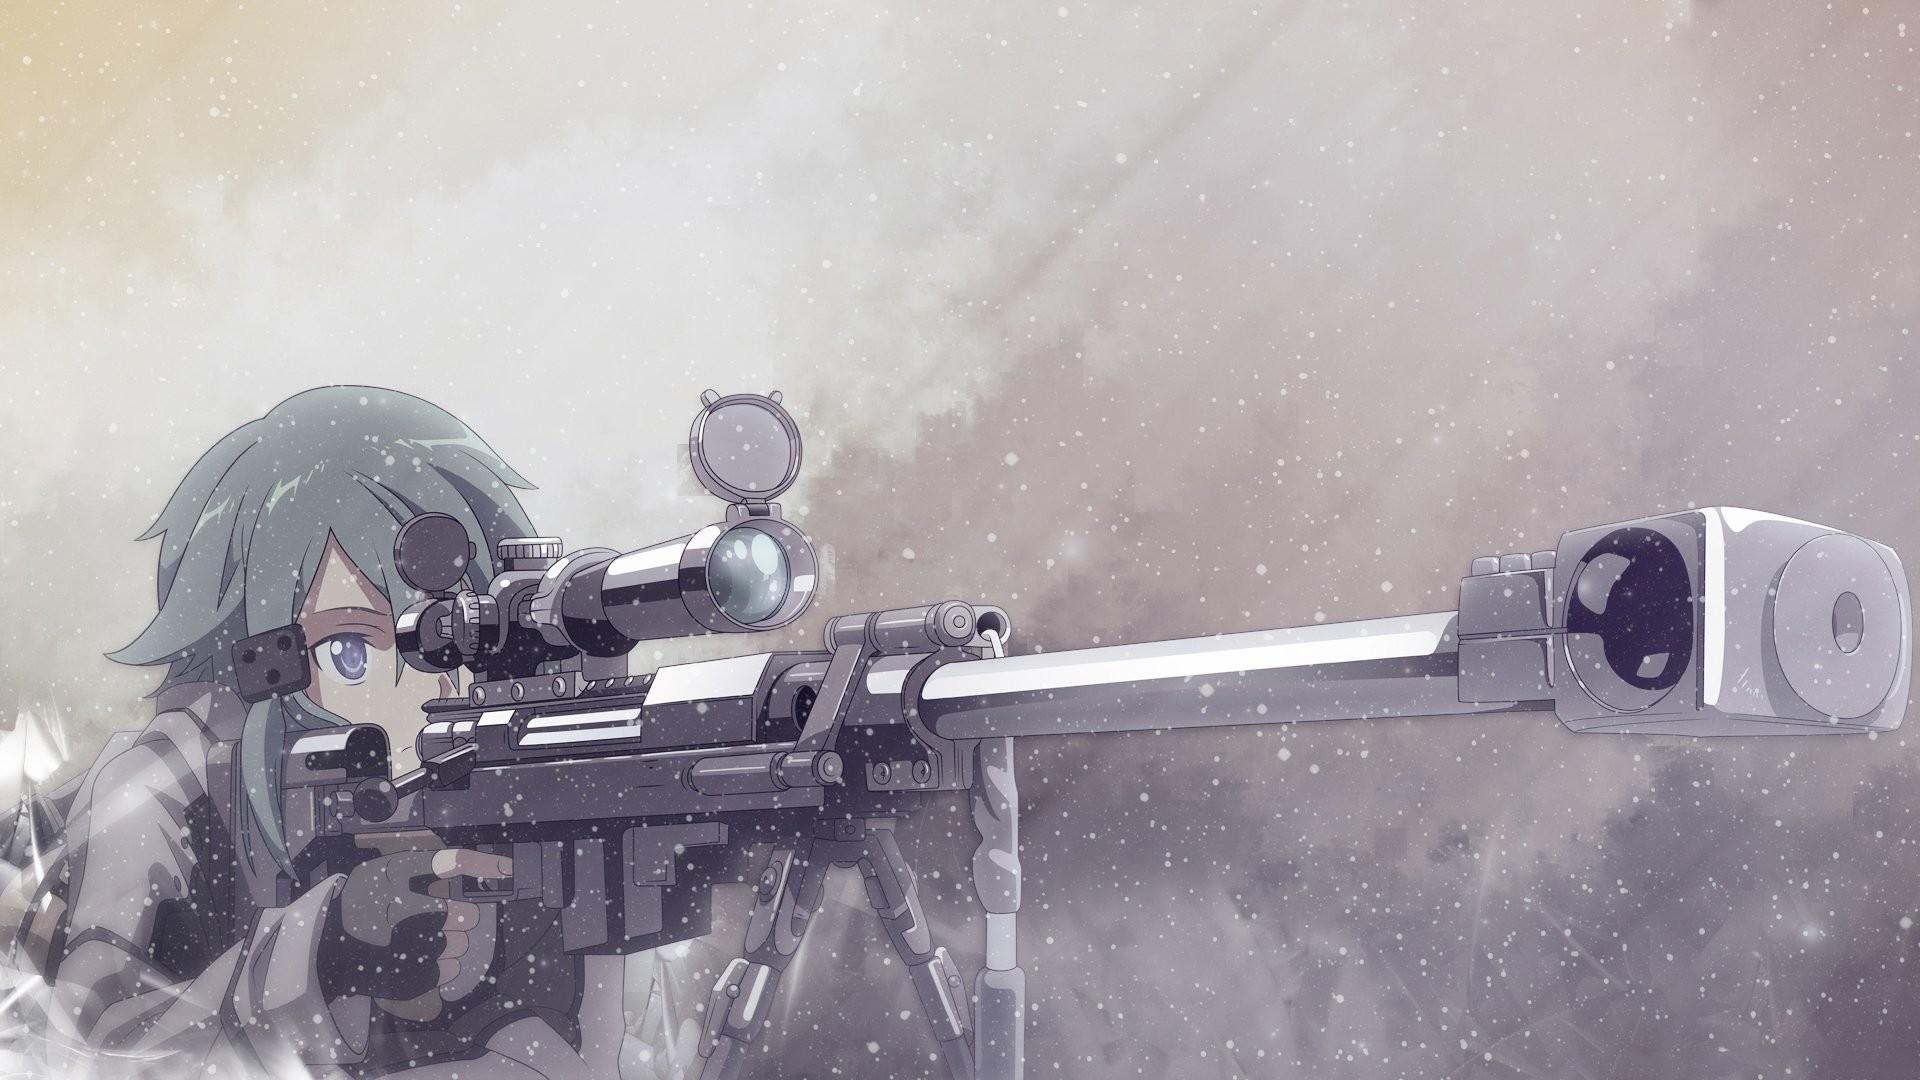 Sinon Gun Gale Online 2 Sniper Rifle Anime Girl Wallpaper 1920×1080 | Sword  Art Online – SAO | Pinterest | Gun gale online, Sword art online and Sword  art